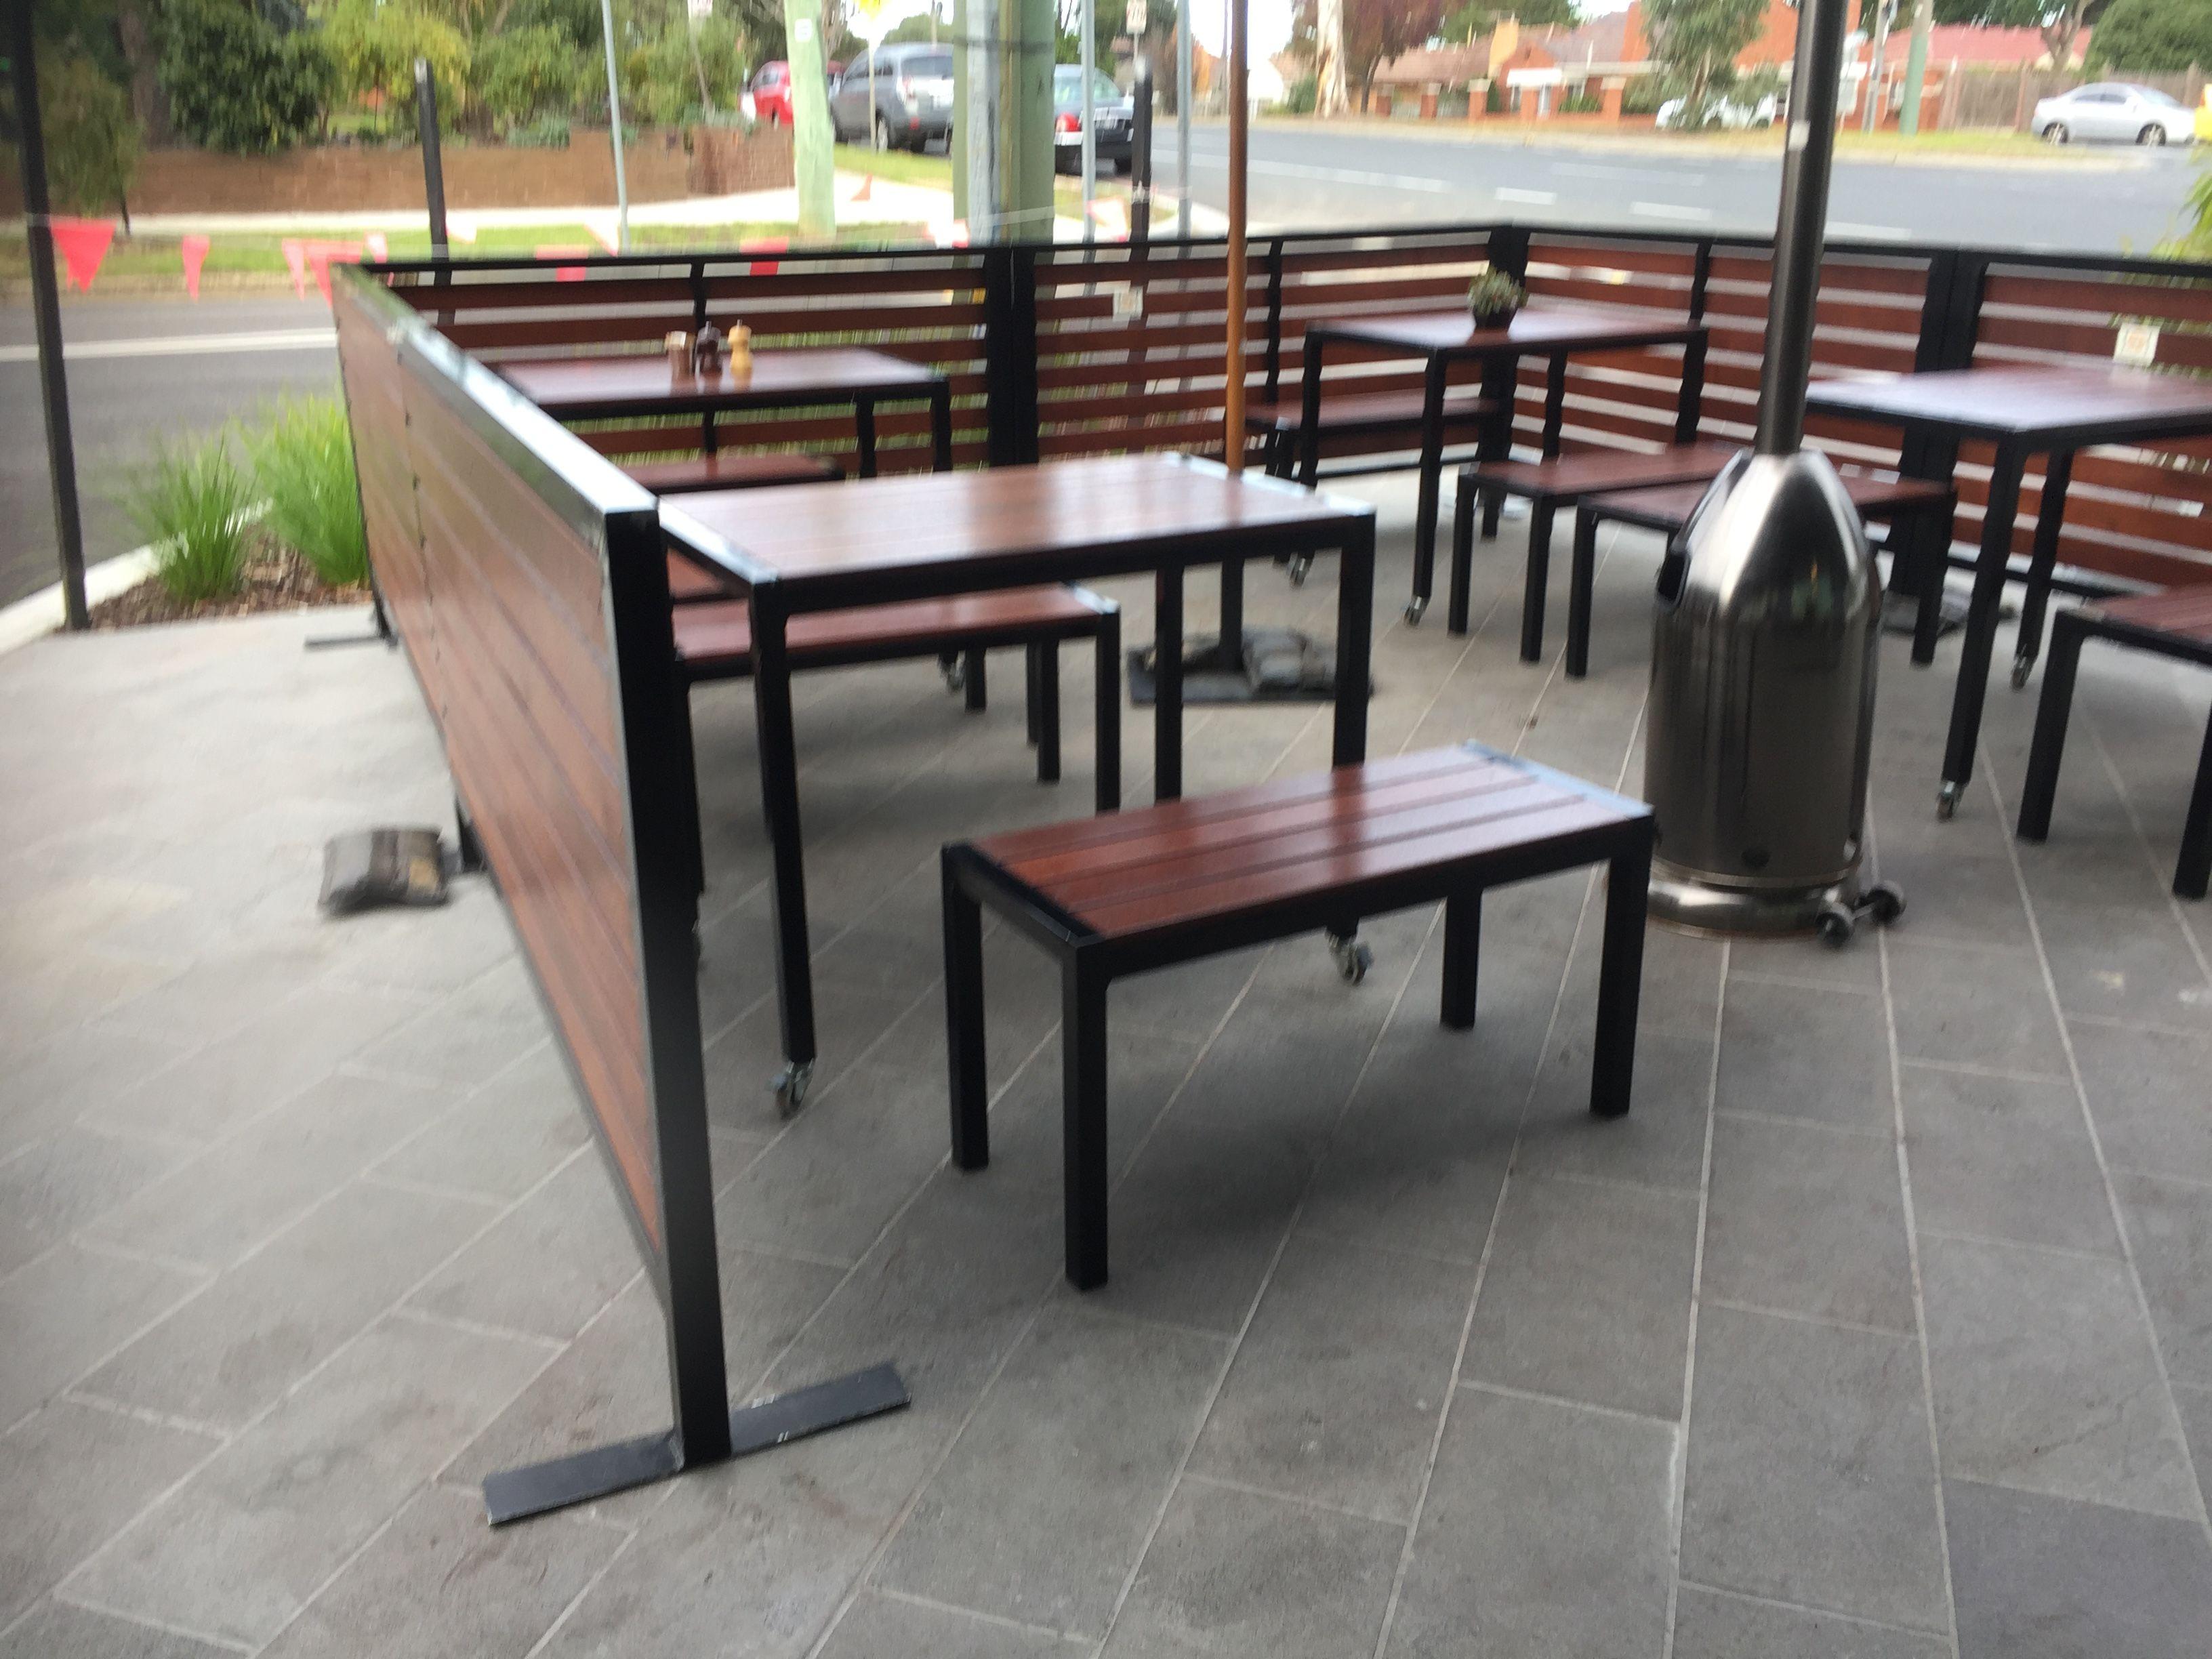 Commercial Outdoor Furniture Melbourne For Cafes Bars